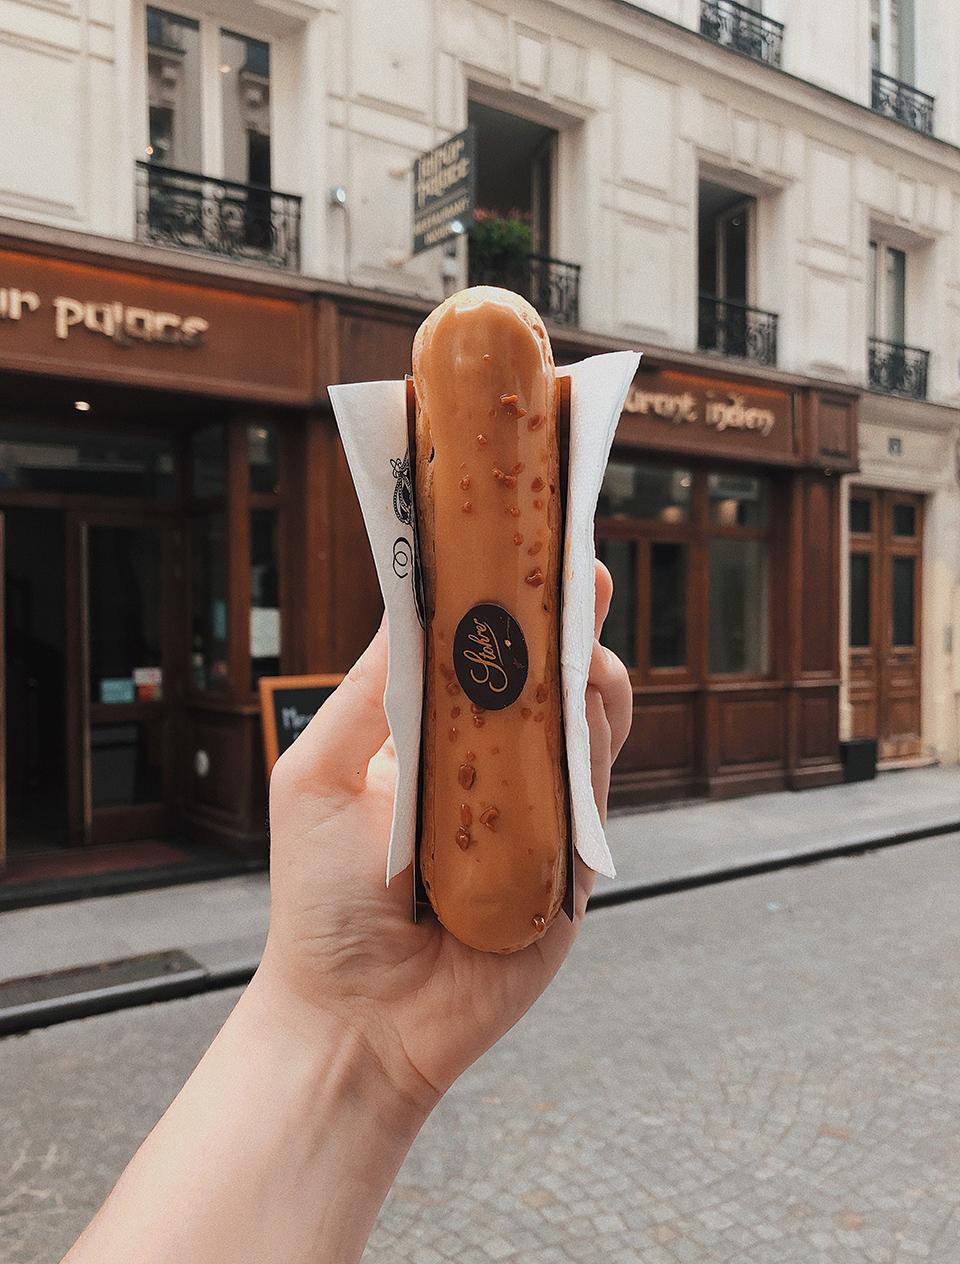 An salted caramel eclair bought at Stohrer in Paris